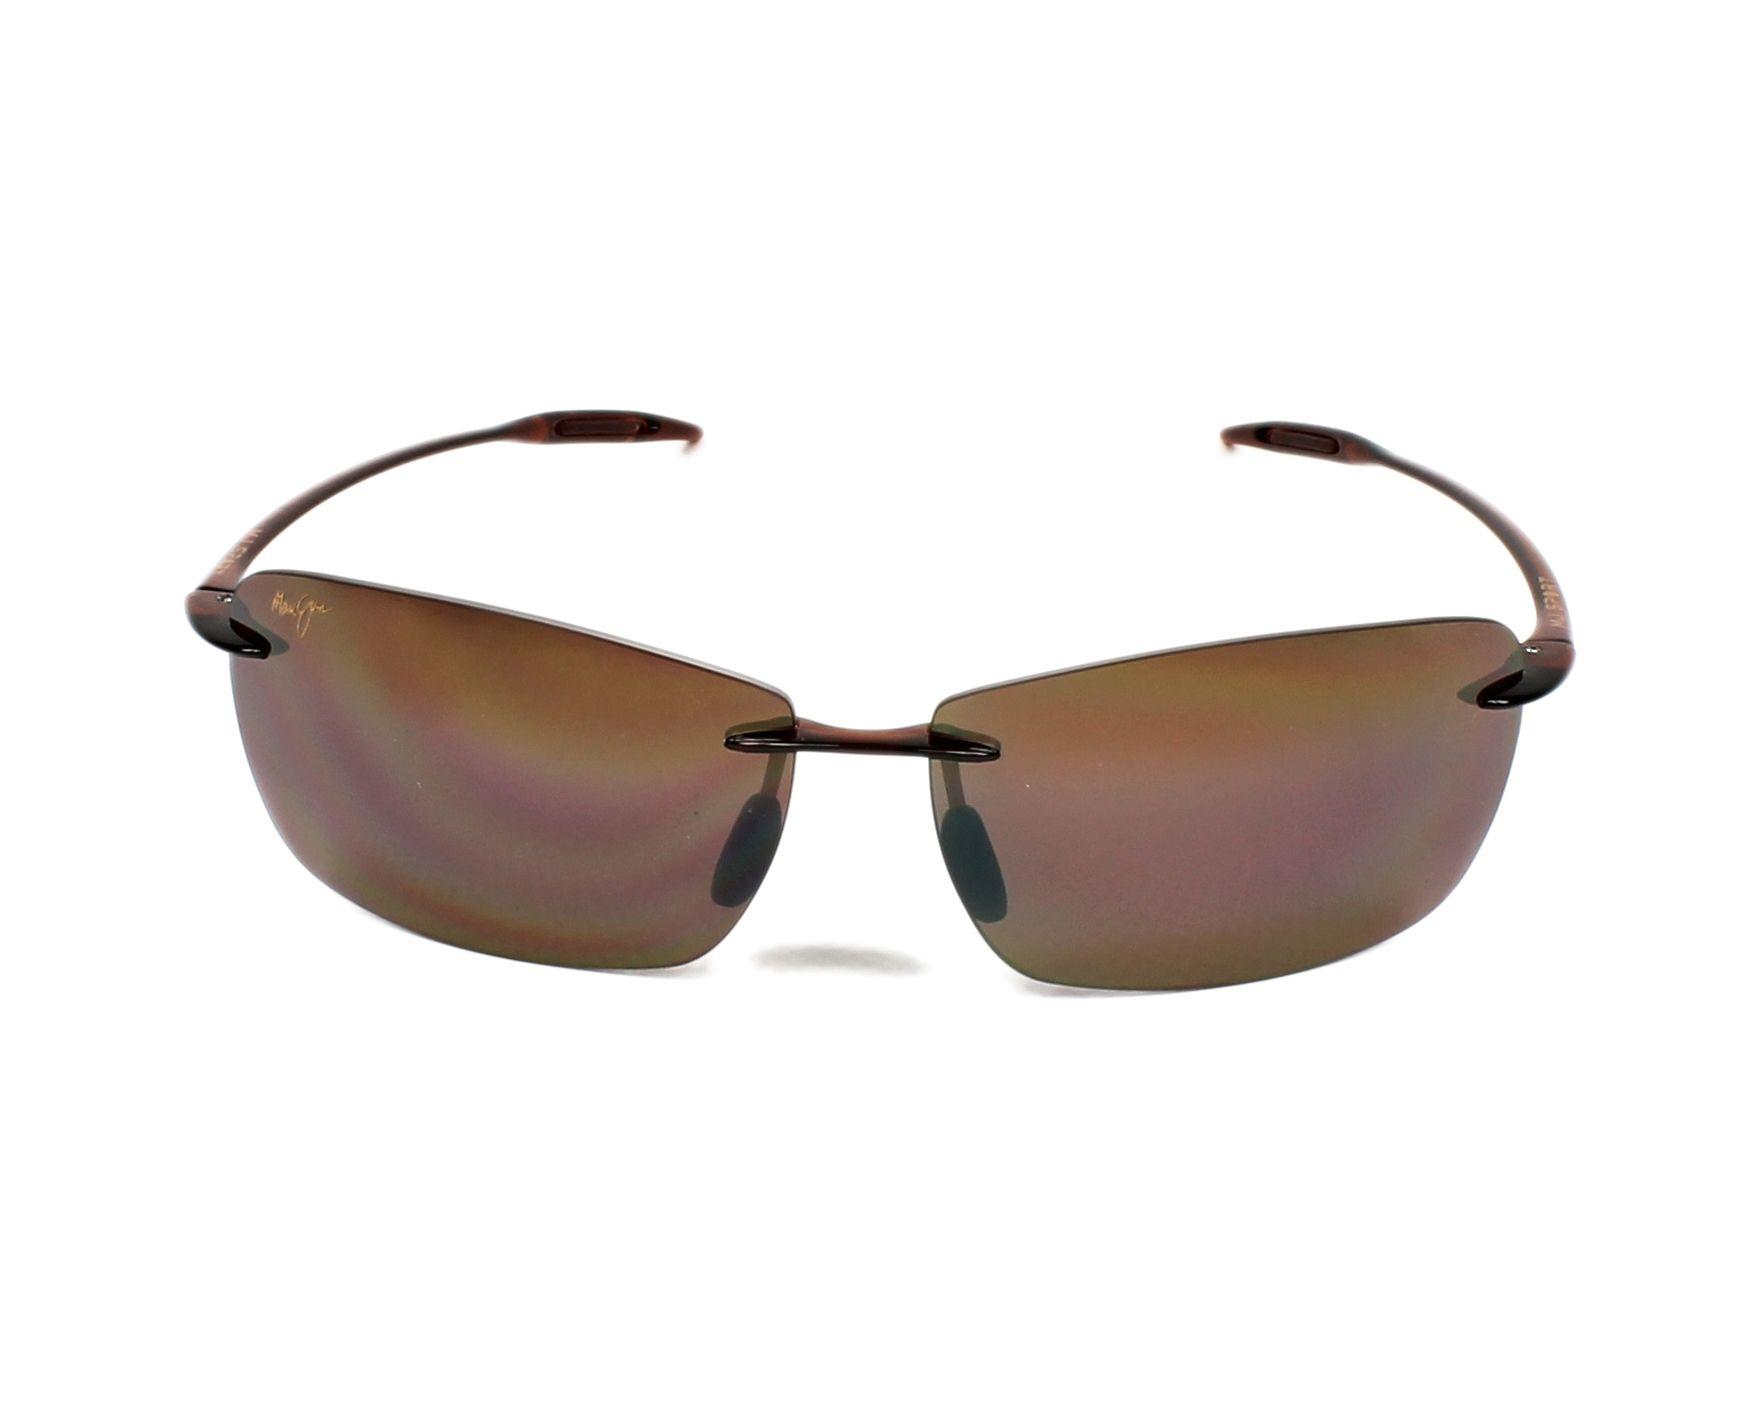 c67ea1376bf Sunglasses Maui Jim H-423 26 67-13 Brown front view